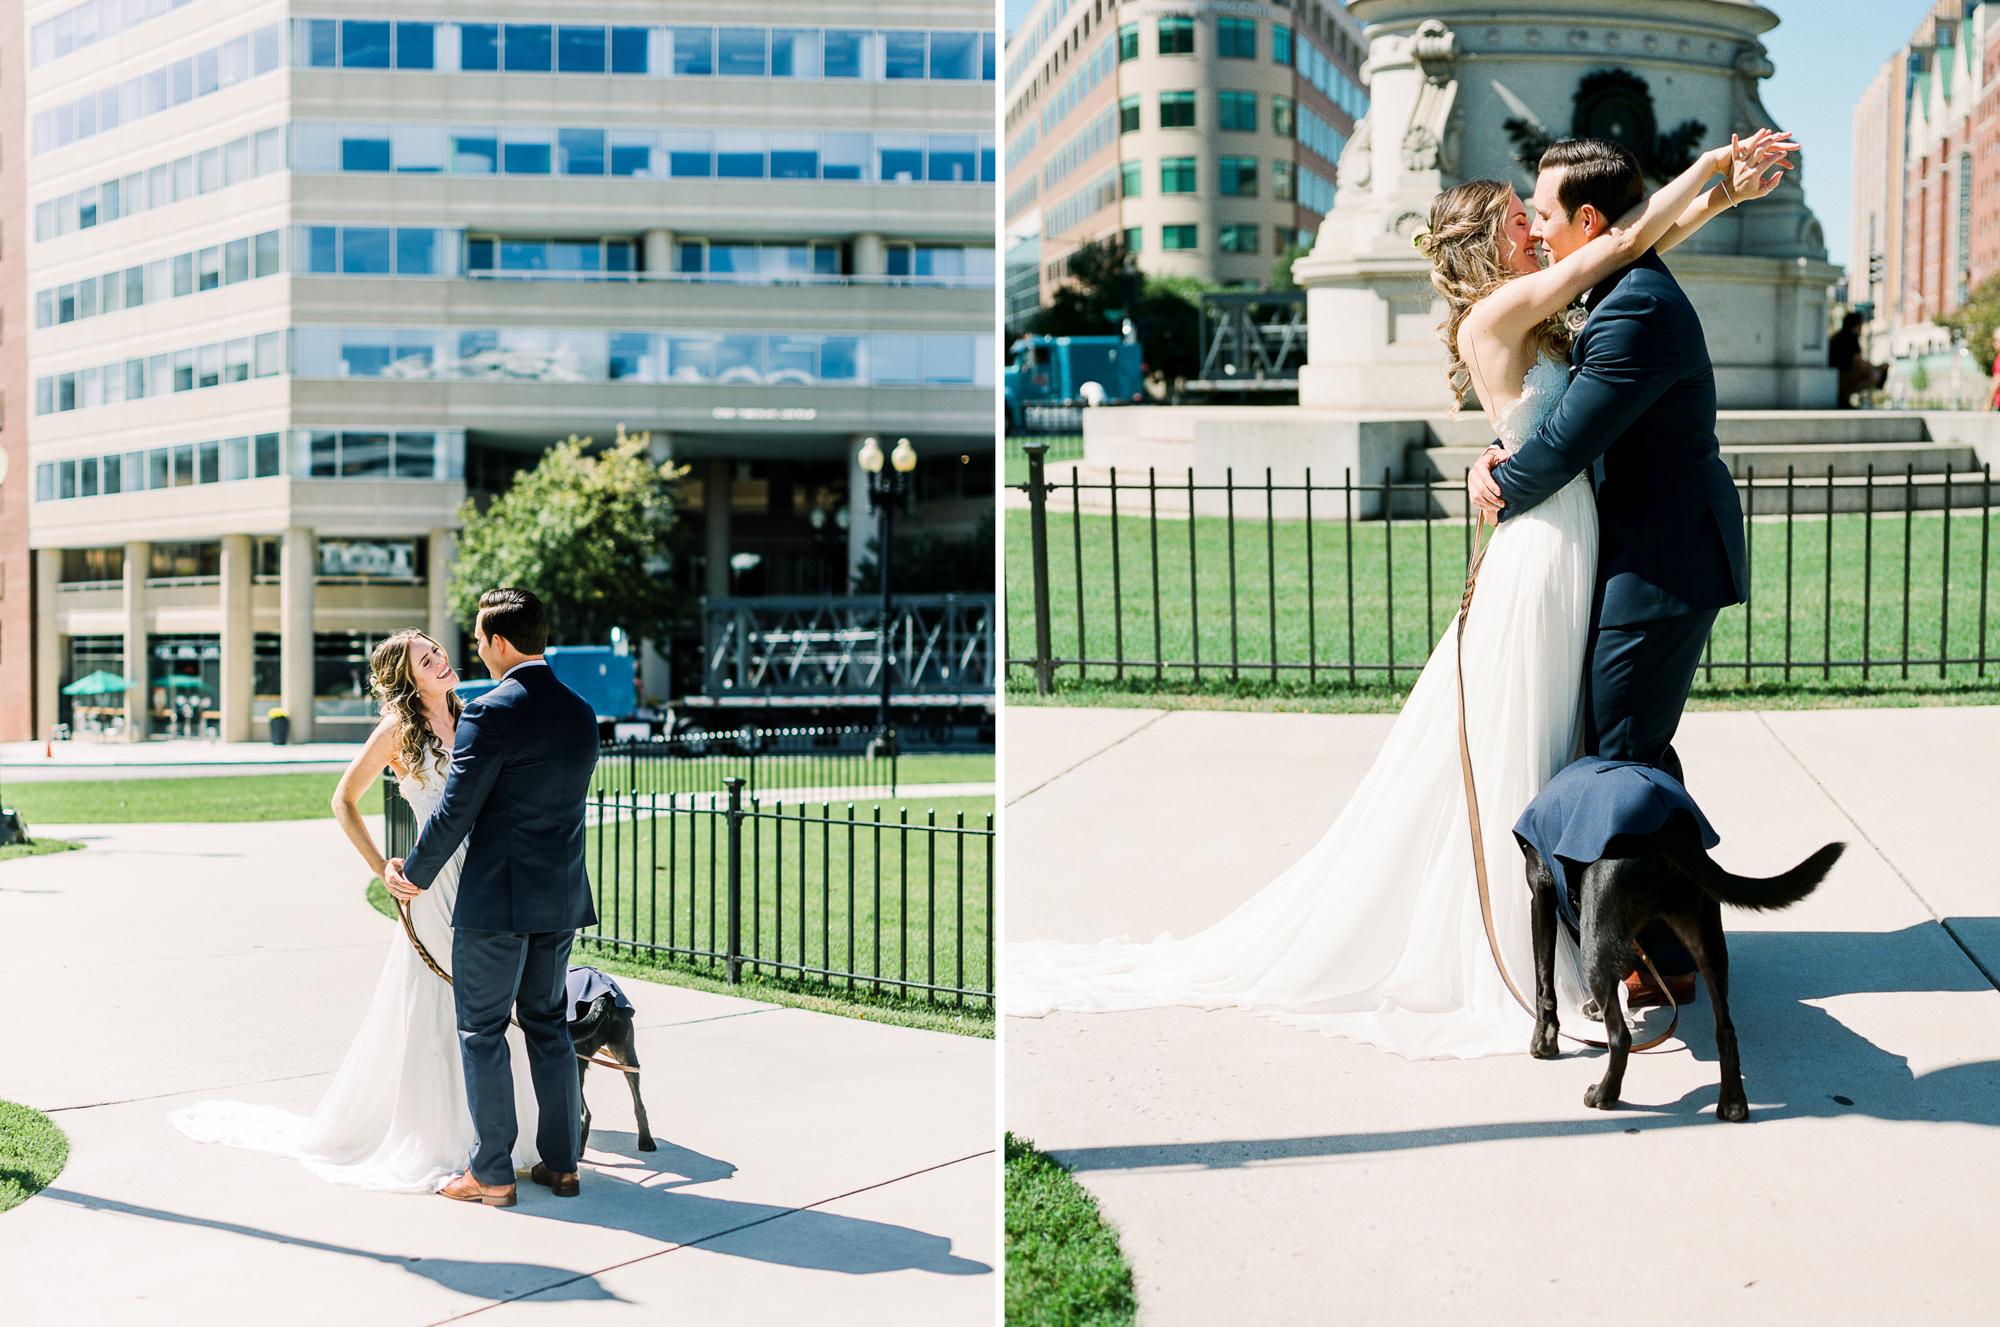 LongView-Gallery-Wedding-Art-Washington-DC-Film-Photographer-7.jpg